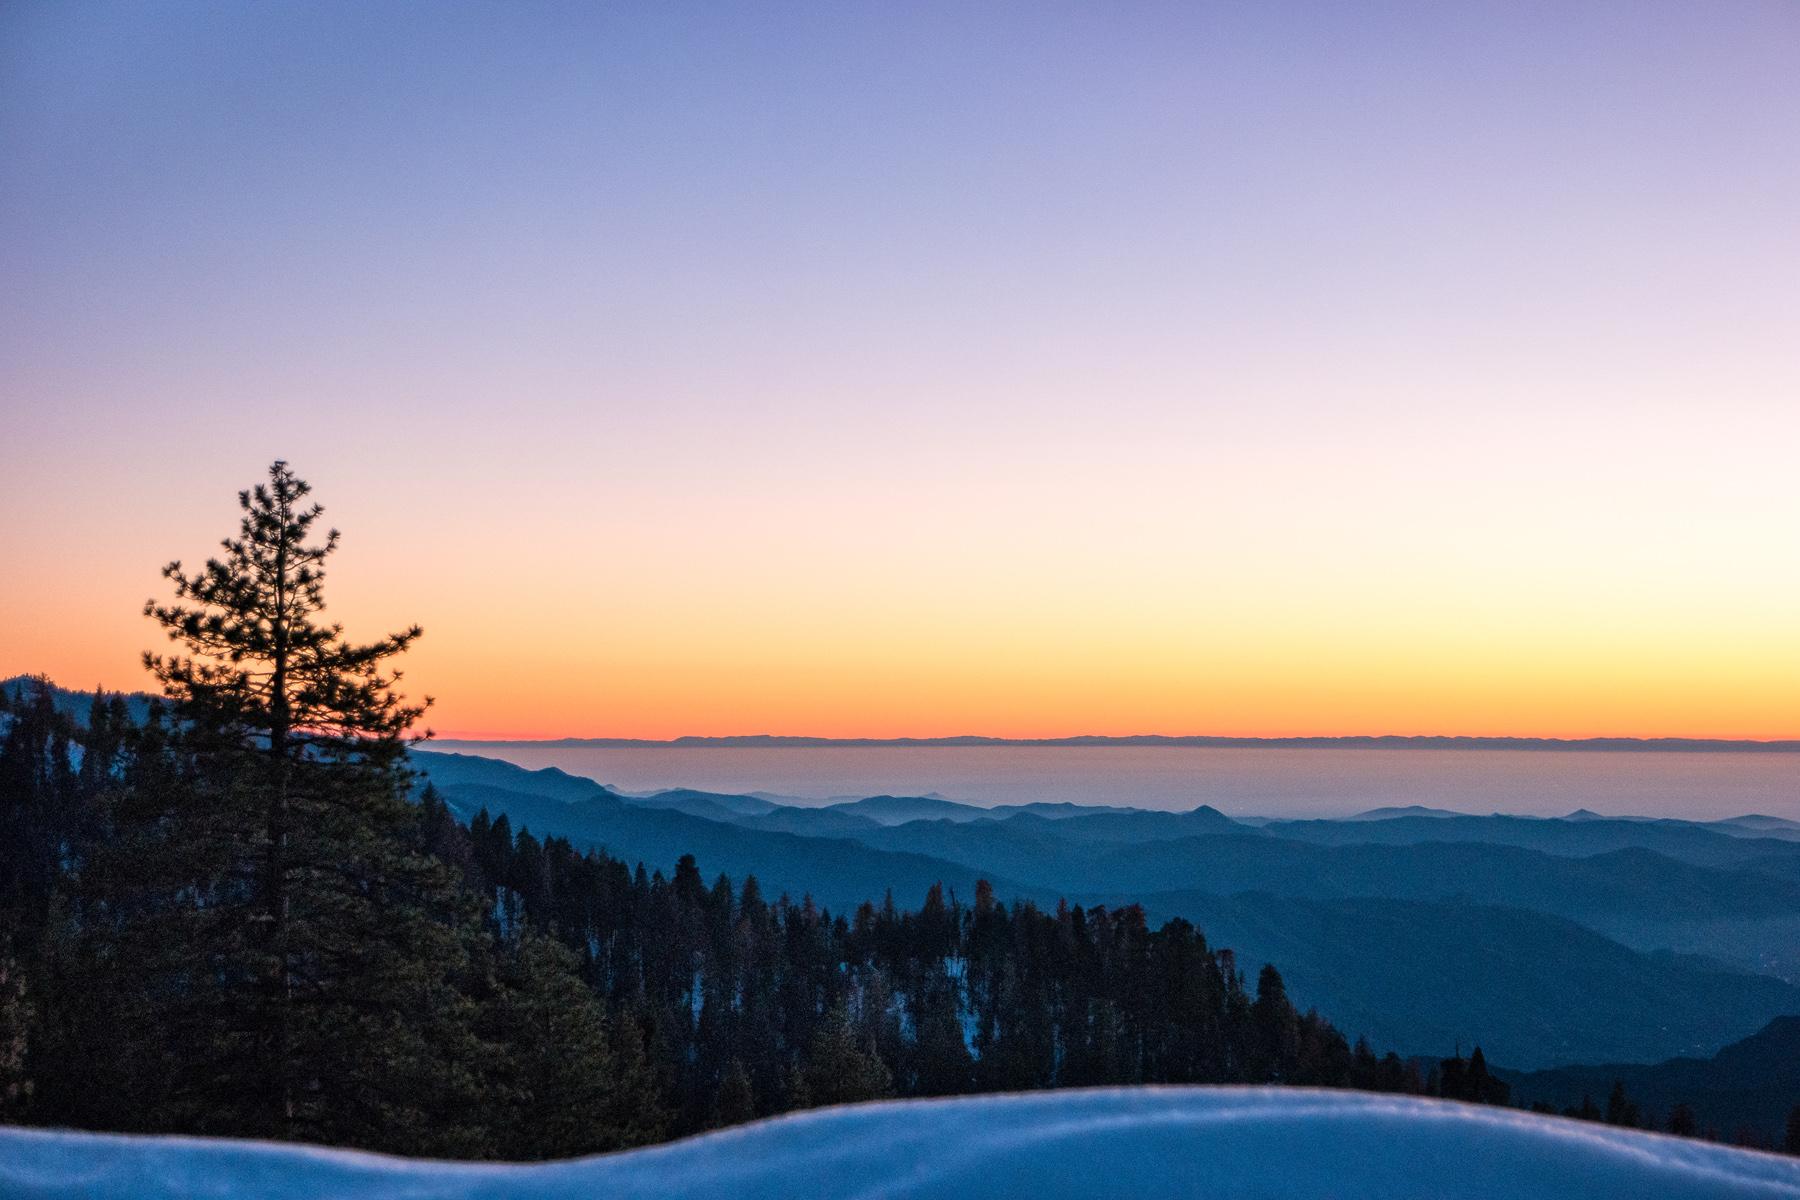 Wasim Muklashy Photography_Sequoia National Park_California_December 2015_-SAM_4674-Edit.jpg